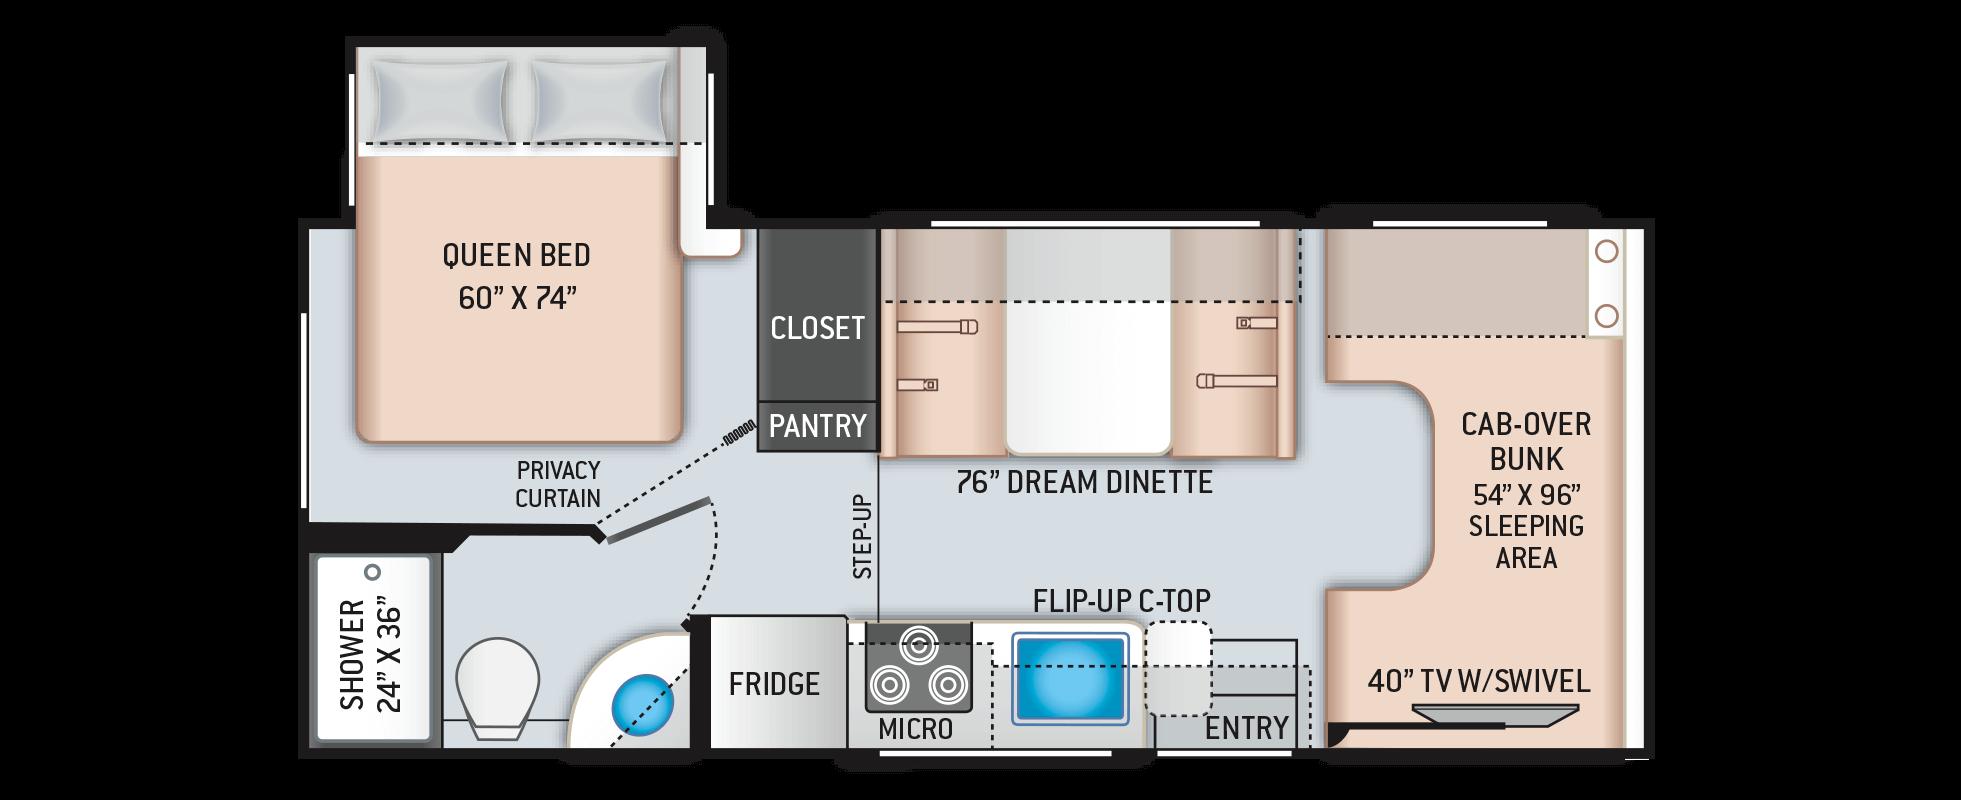 Freedom Elite Class C Motorhomes Floor Plan 22fe Thor